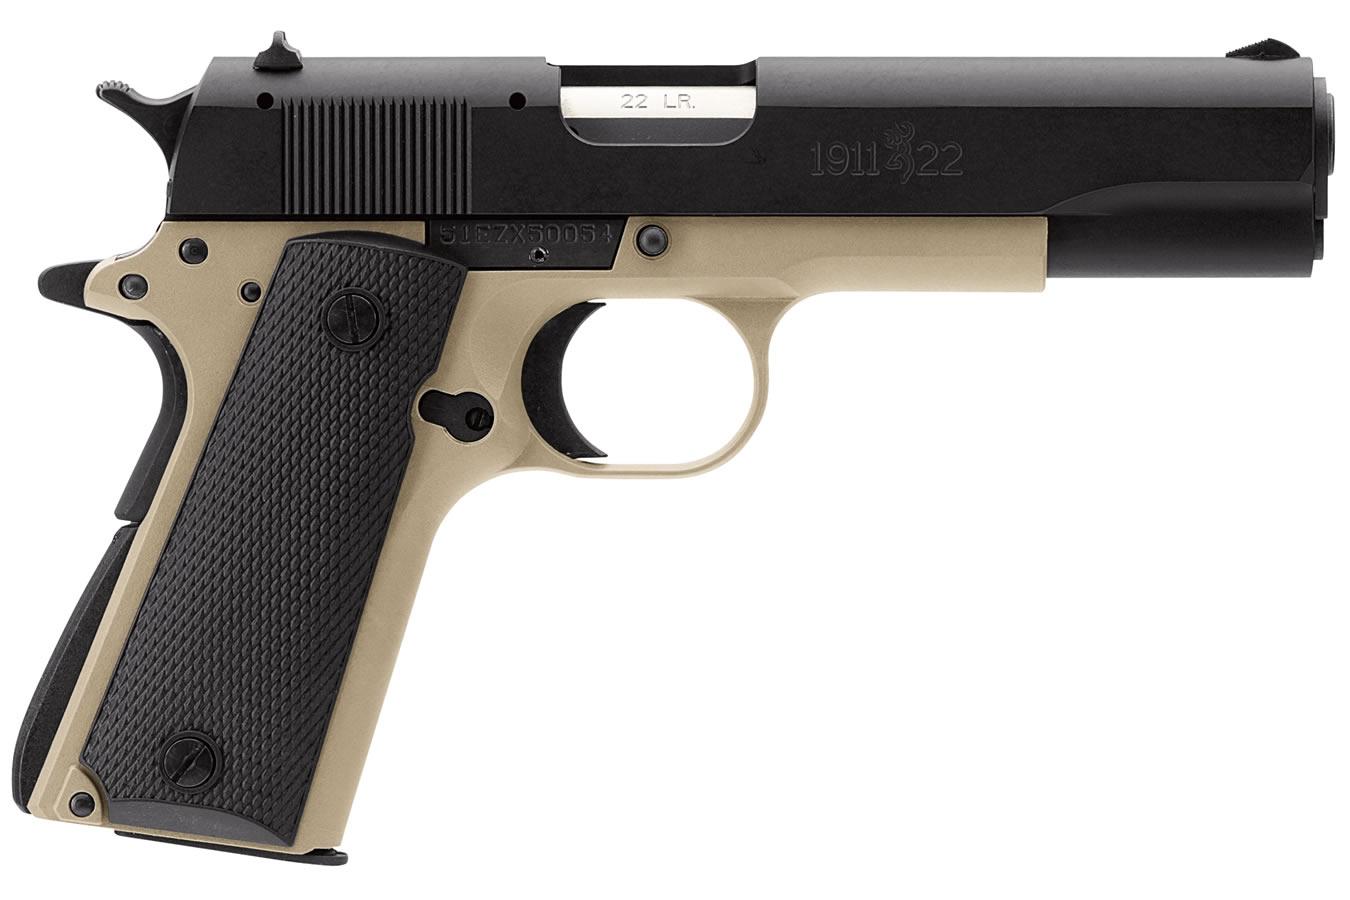 Browning 1911-22 A1 22LR Full-Size Desert Tan Rimfire Pistol ...